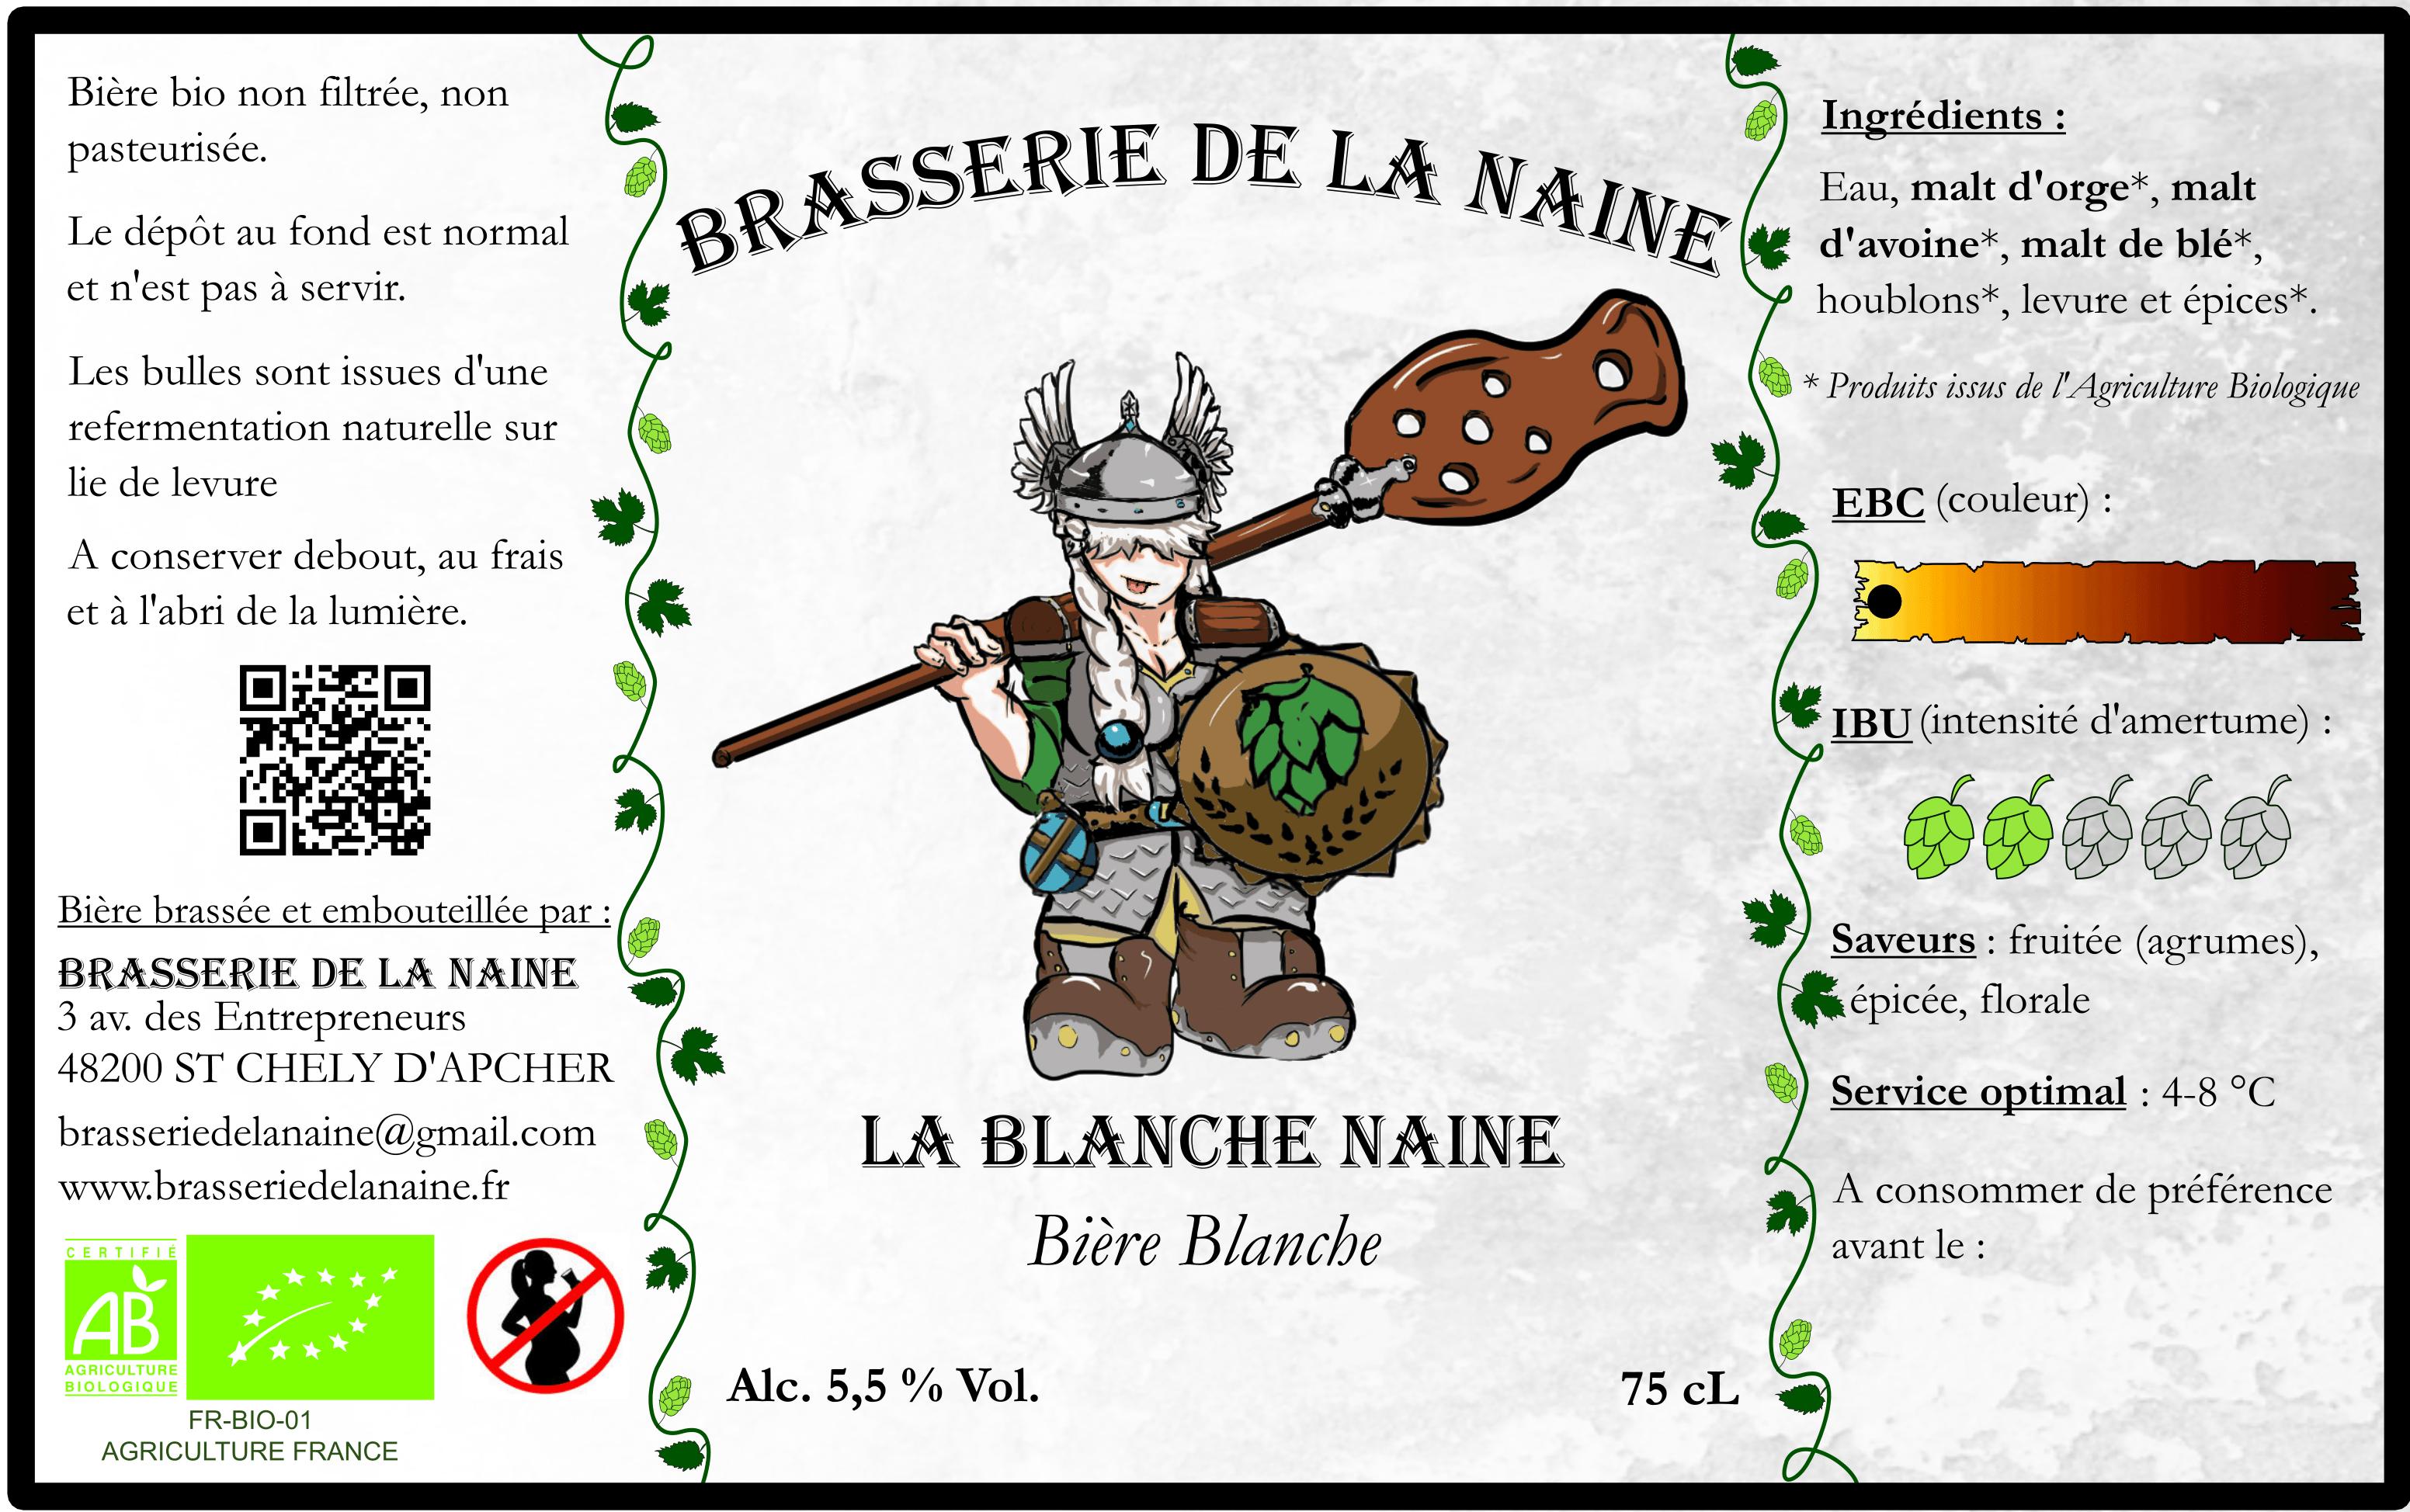 180828_etiq-blanchenaine75corab1.png